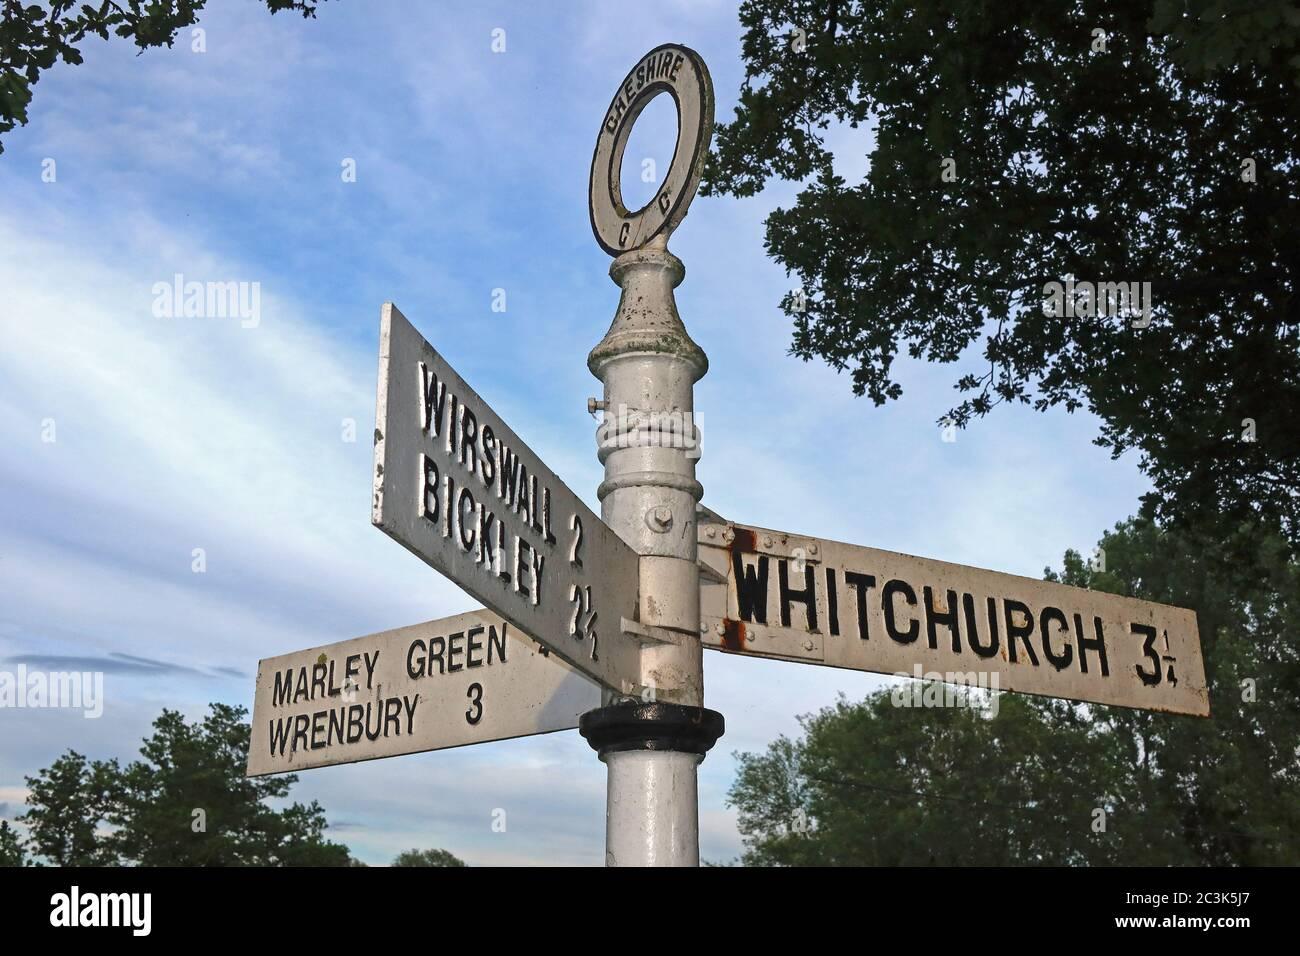 GoTonySmith,HotpixUK,@HotpixUK,village green,signposts,Whitchurch,Wirswall,Bickley,Marley Green,Wrenbury,Wirswall sign,Bickley sign,Wrenbury sign,villages,road sign,road signs,junction